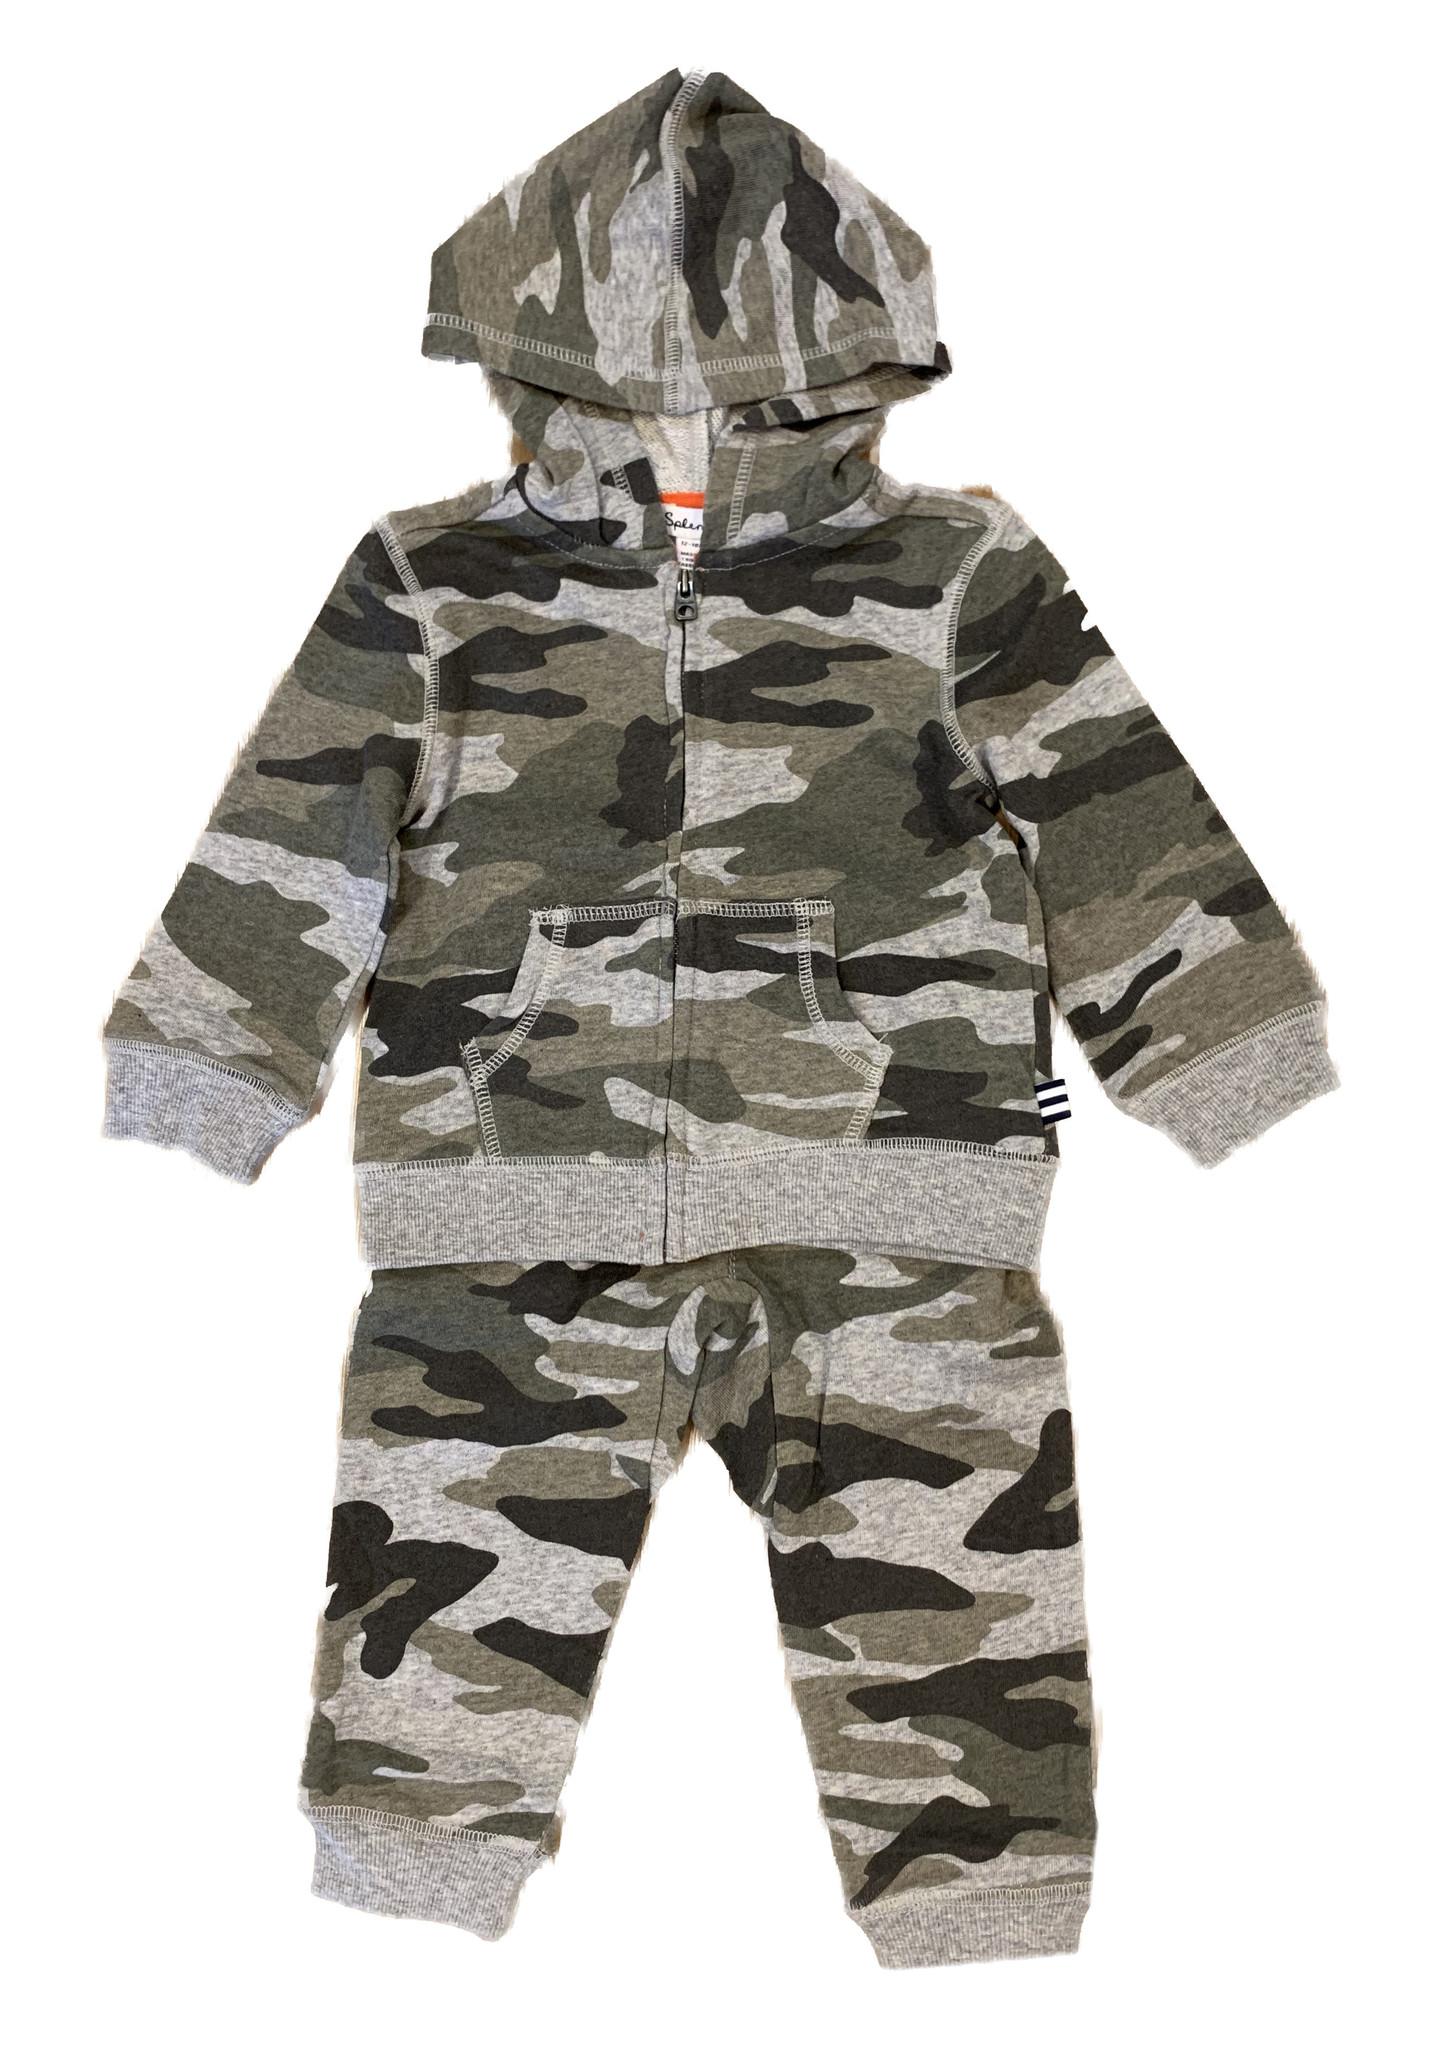 Splendid Green Camo Toddler Sweatsuit